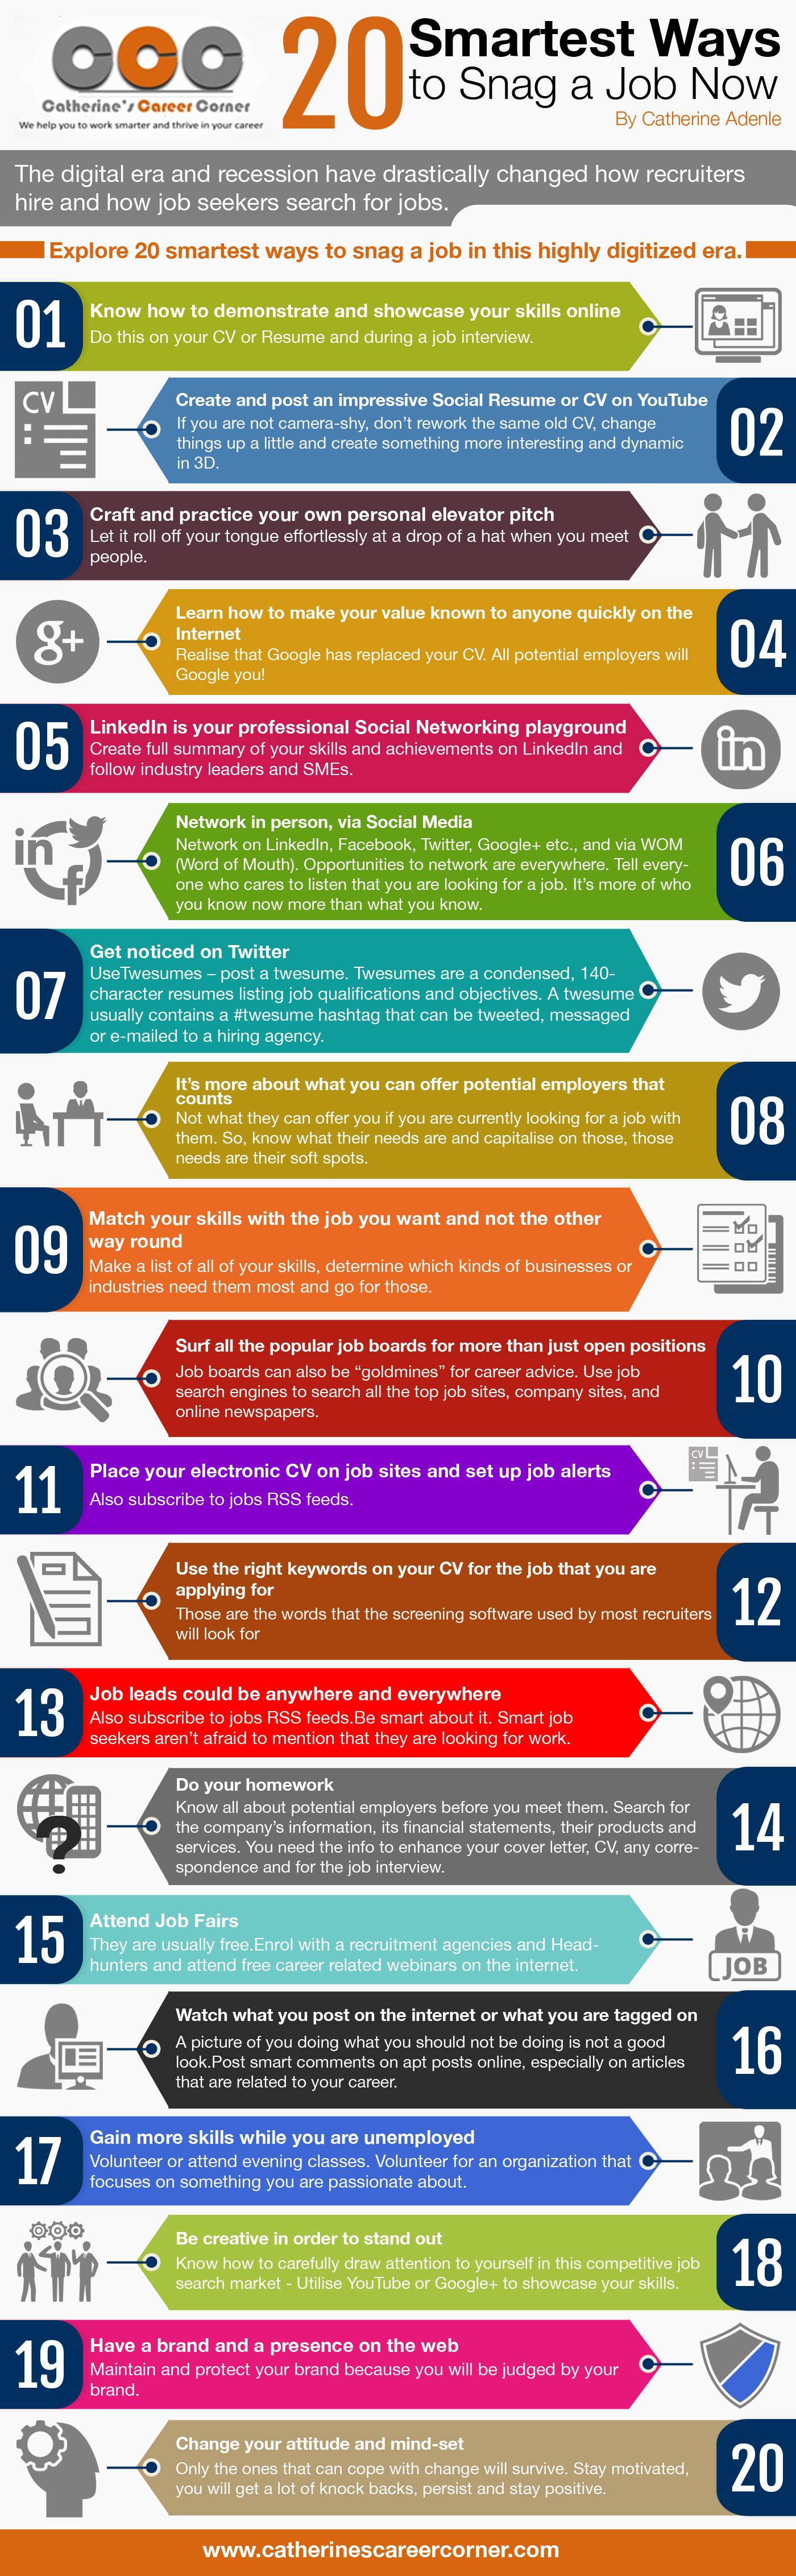 20 Quickest Ways to Get a Job Now